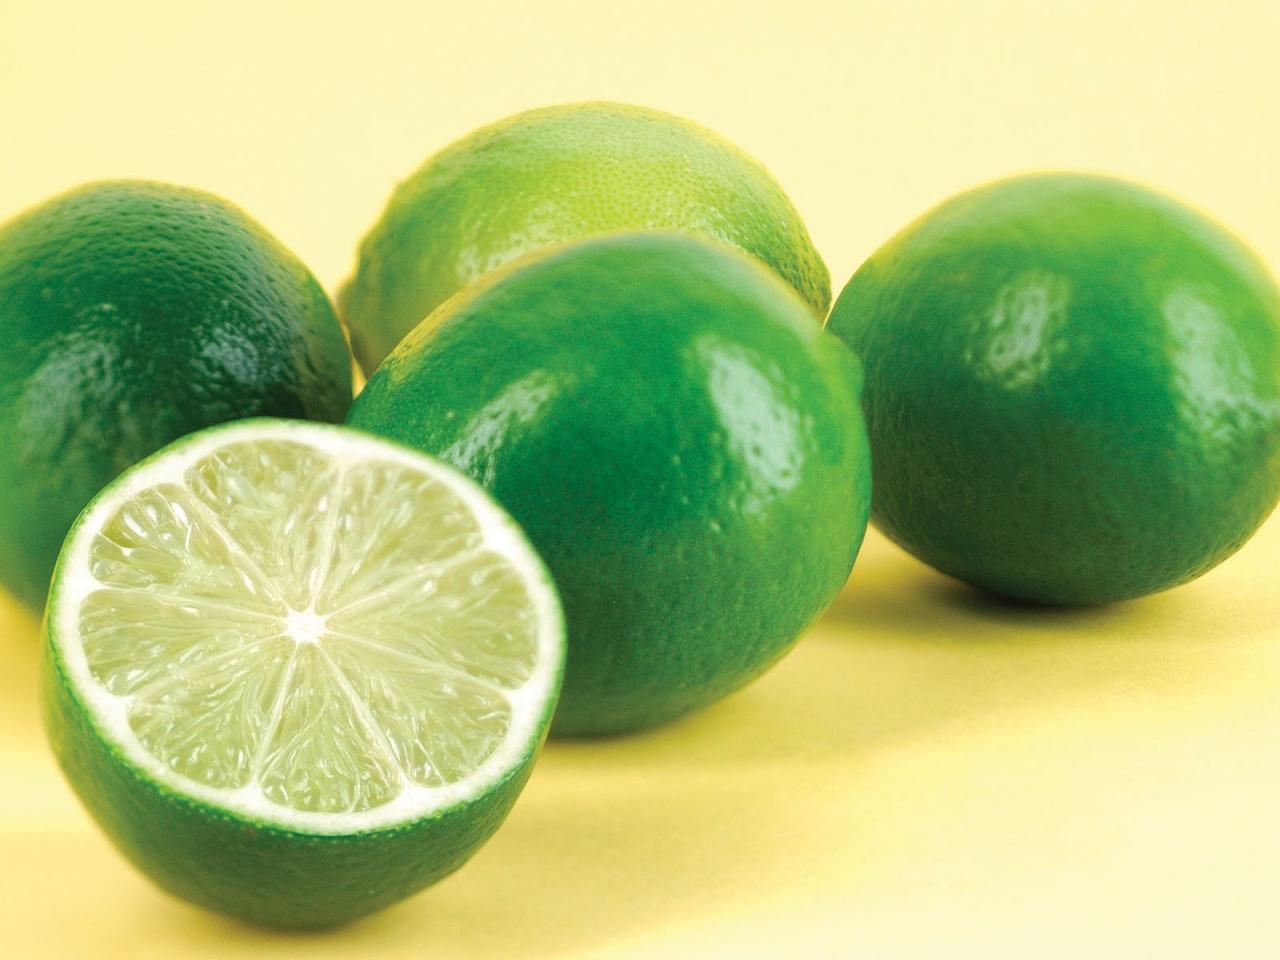 http://3.bp.blogspot.com/-rELQI9IbAEQ/UG5lYlkzq2I/AAAAAAAACdo/mQejl0OQrCk/s1600/green-lemon-fruit-wallpaper-163_1280x960.jpg